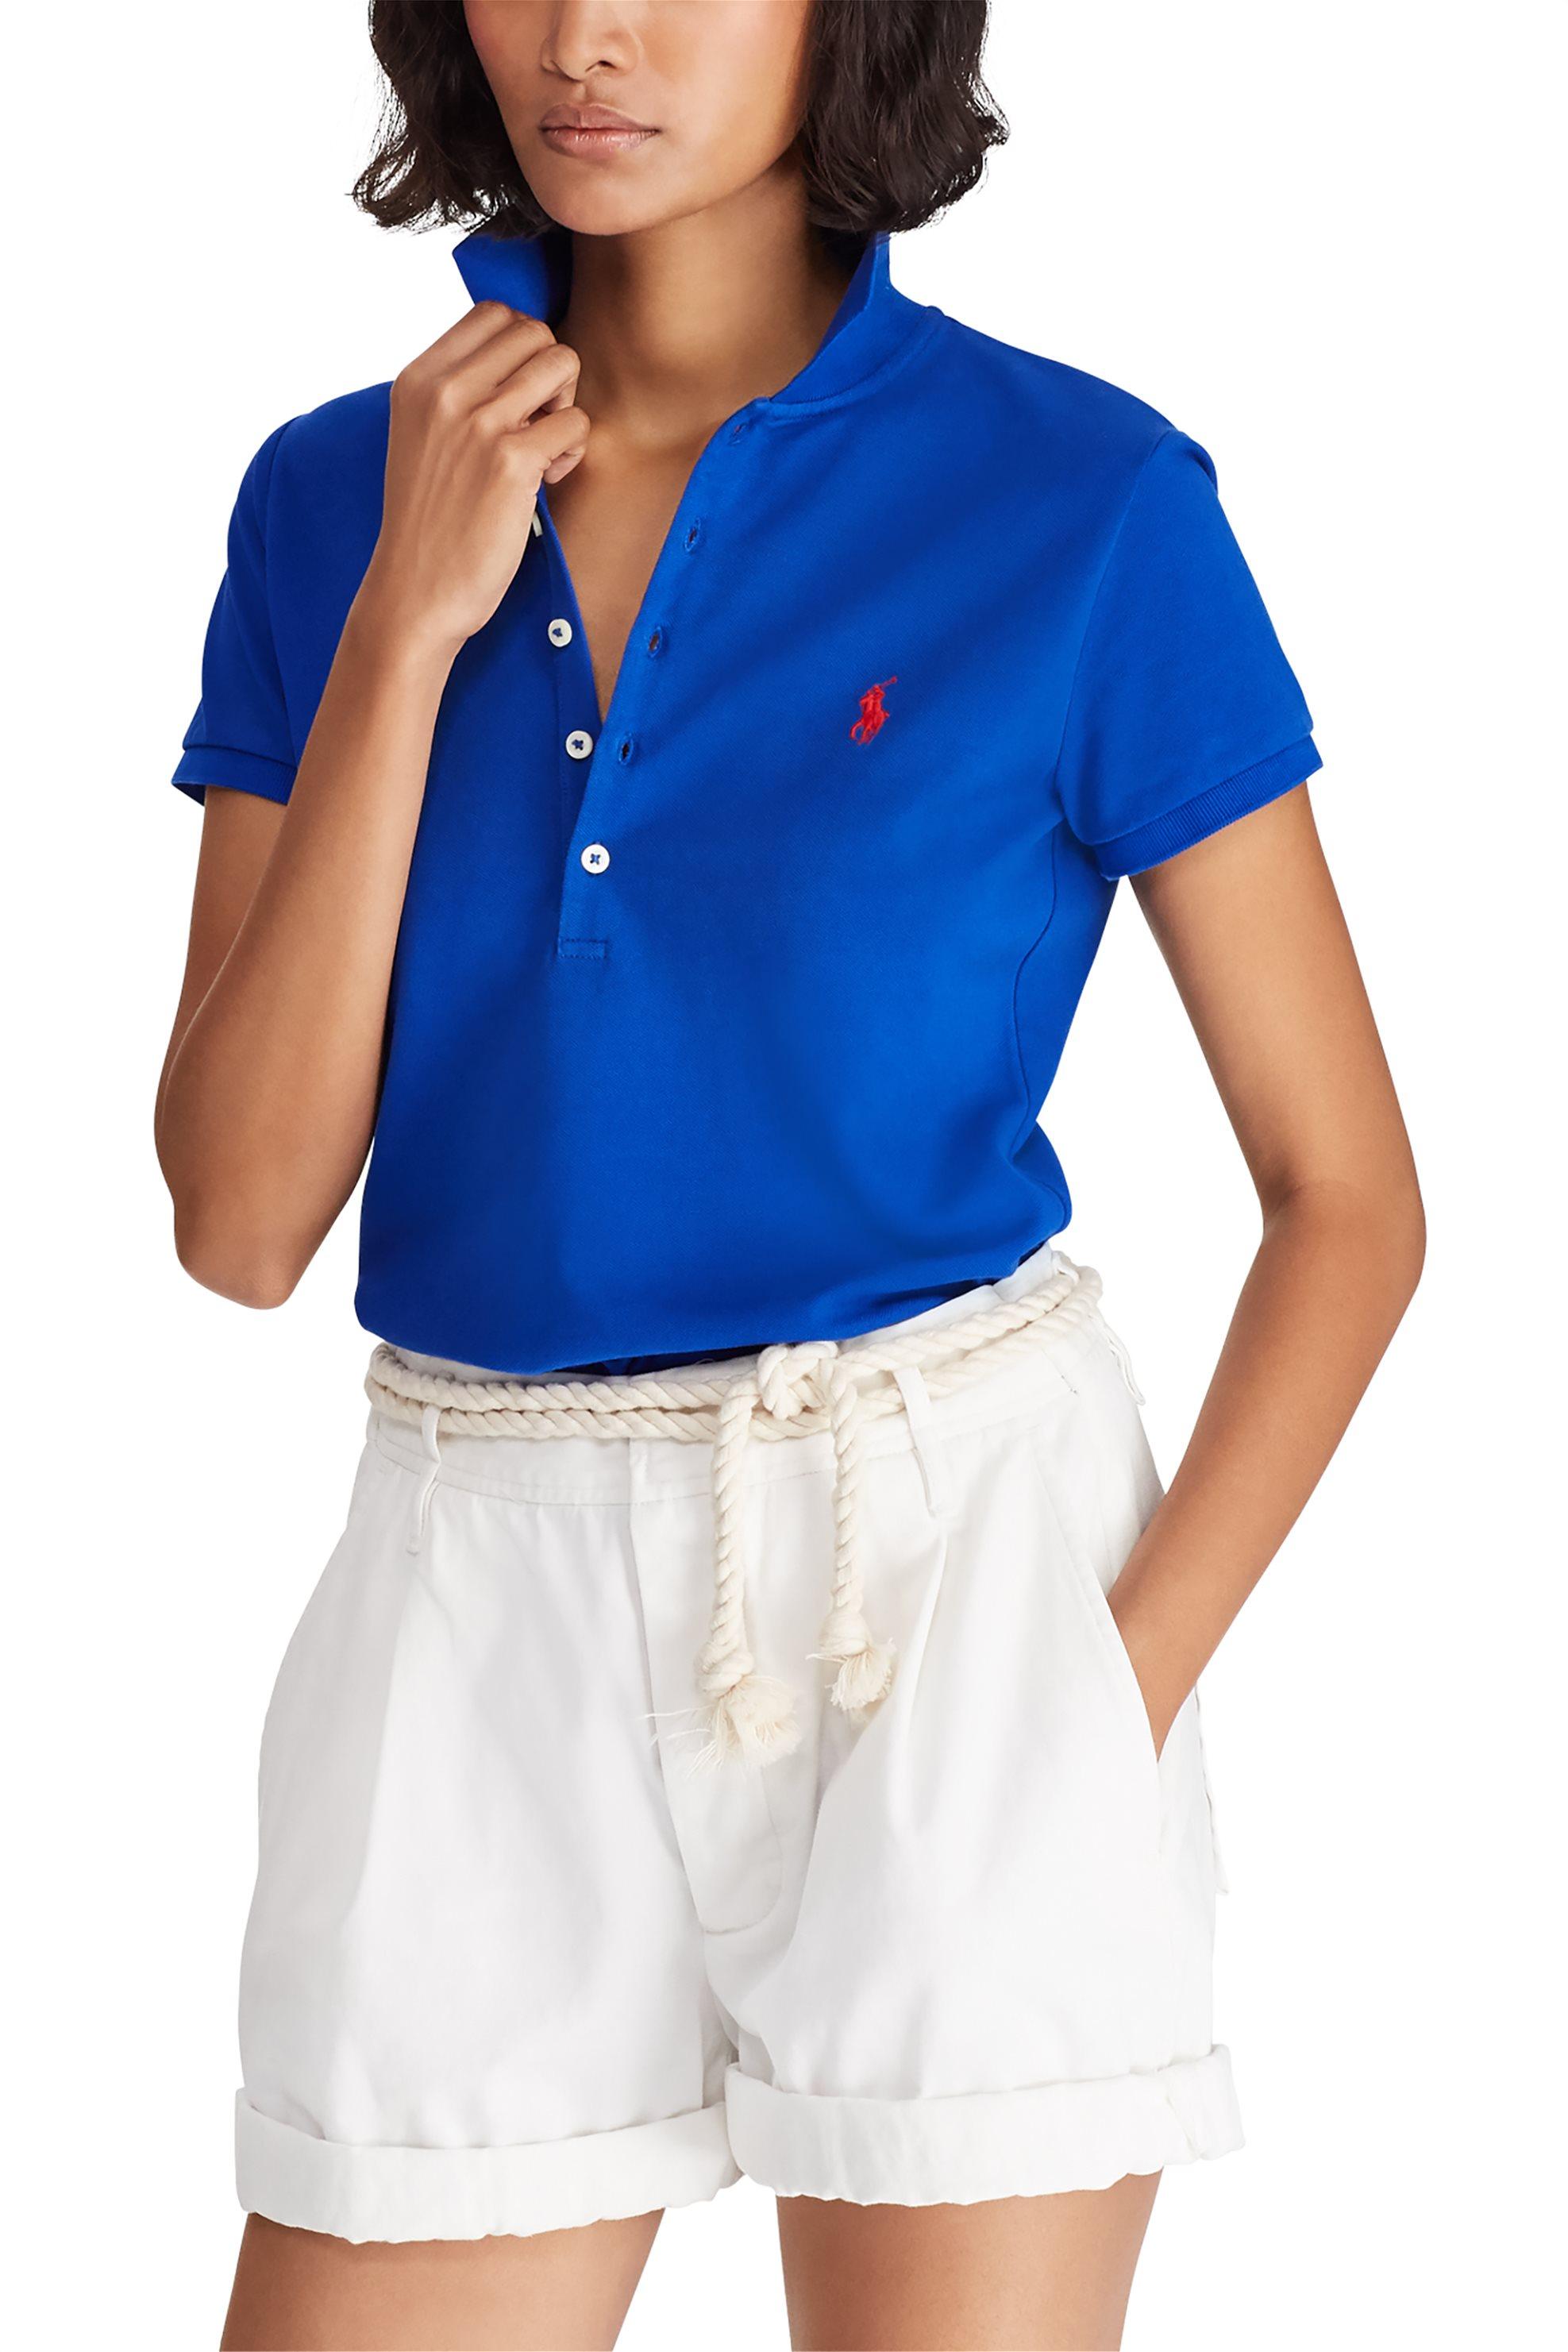 Polo Ralph Lauren γυναικεία μπλούζα Polo με χρωματιστό λογότυπο Slim Fit - 21150 γυναικα   ρουχα   tops   μπλούζες   πόλο